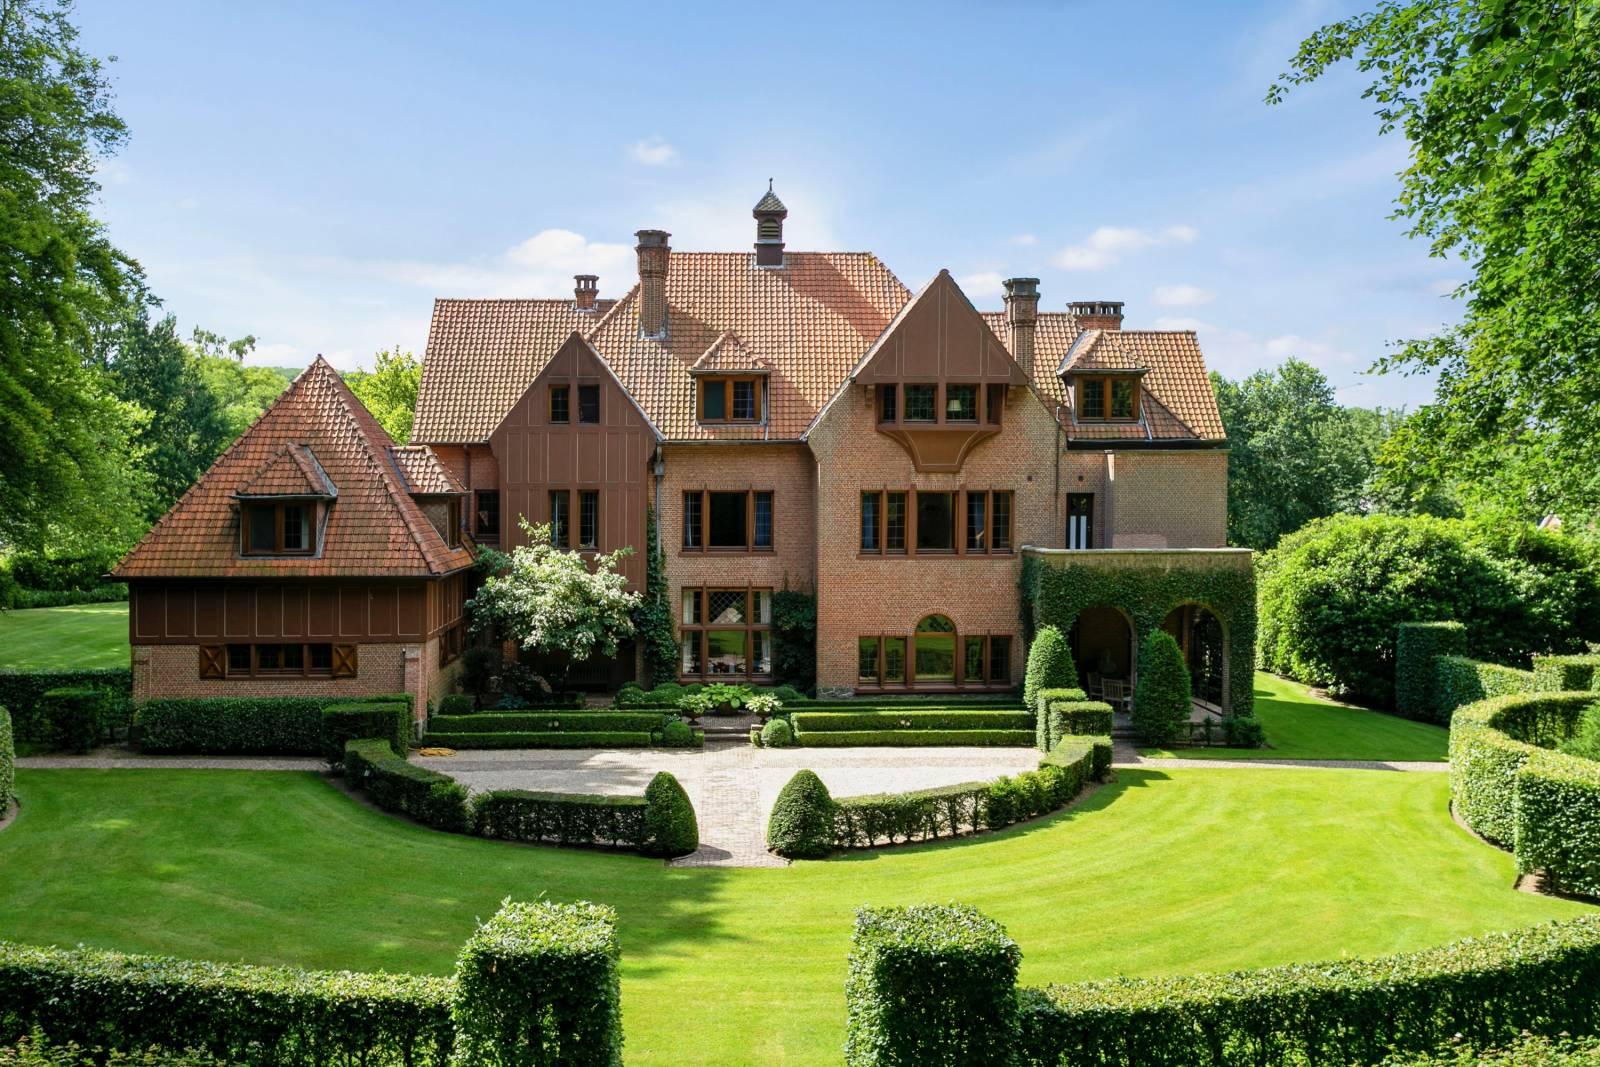 Louise Marie Manor Gardens - Feestzaal - House Of Weddings - 30